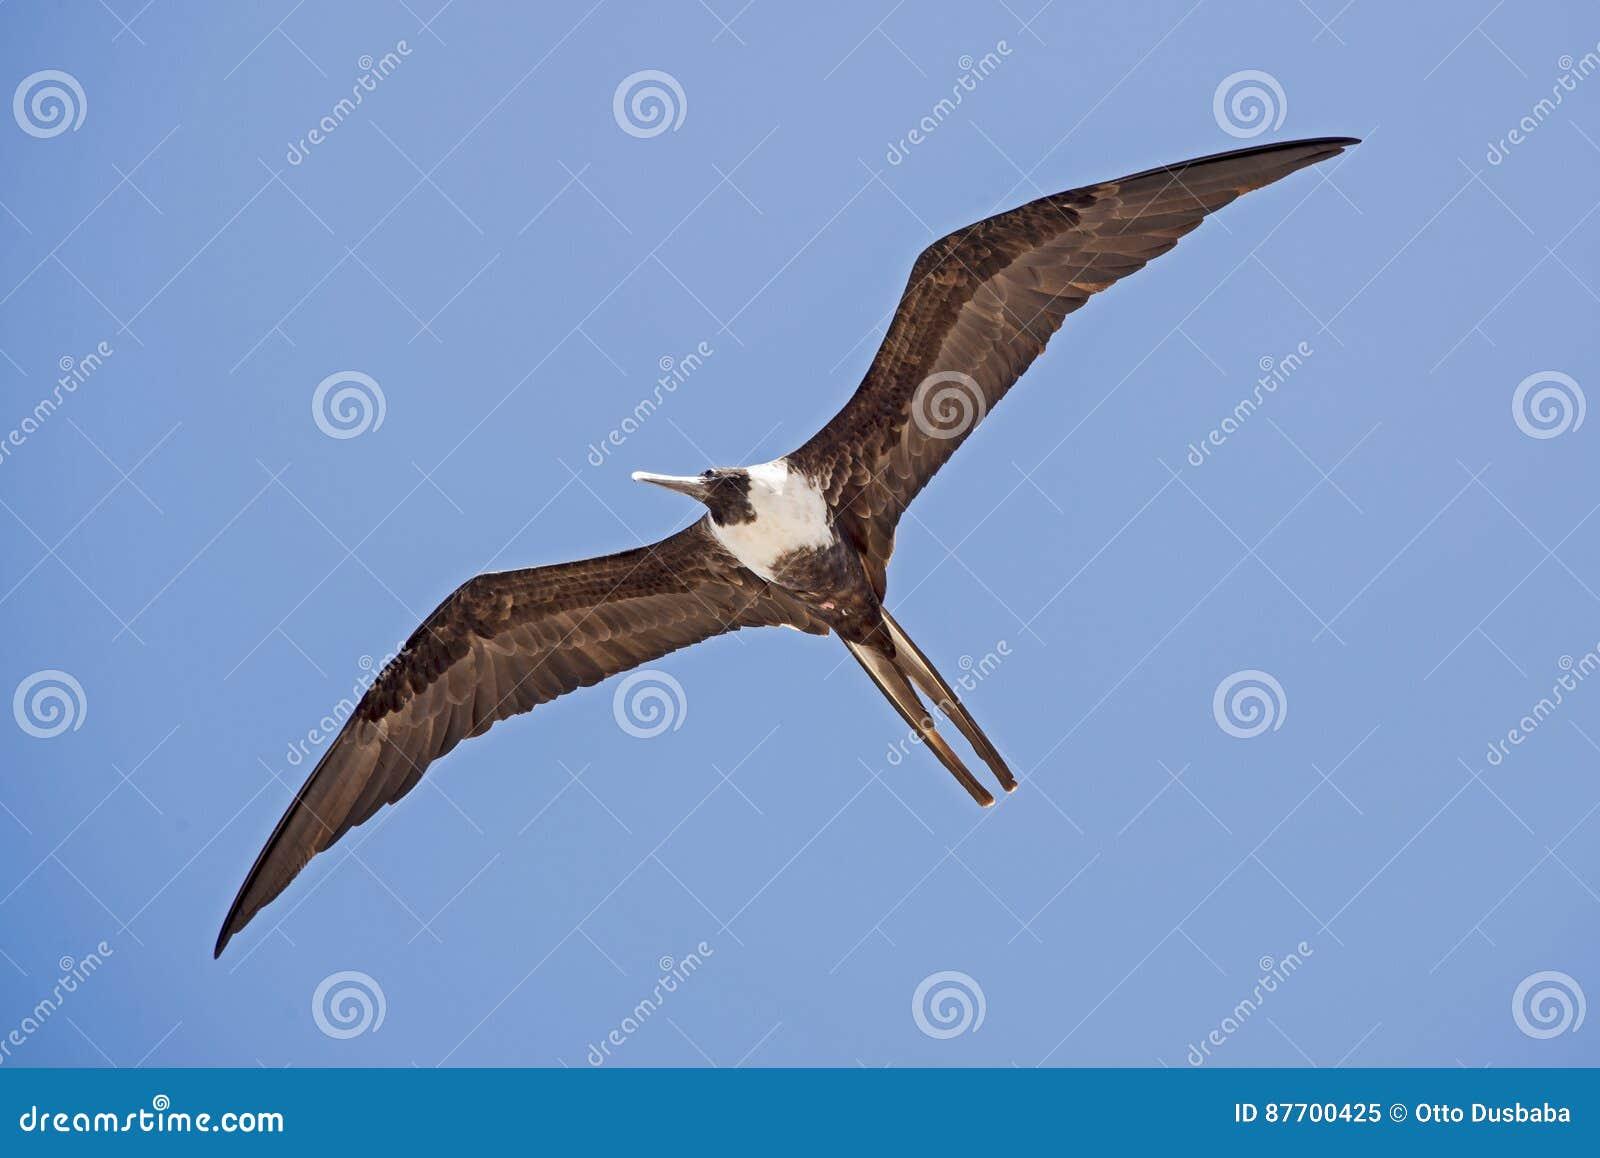 Seabird soaring in the sky